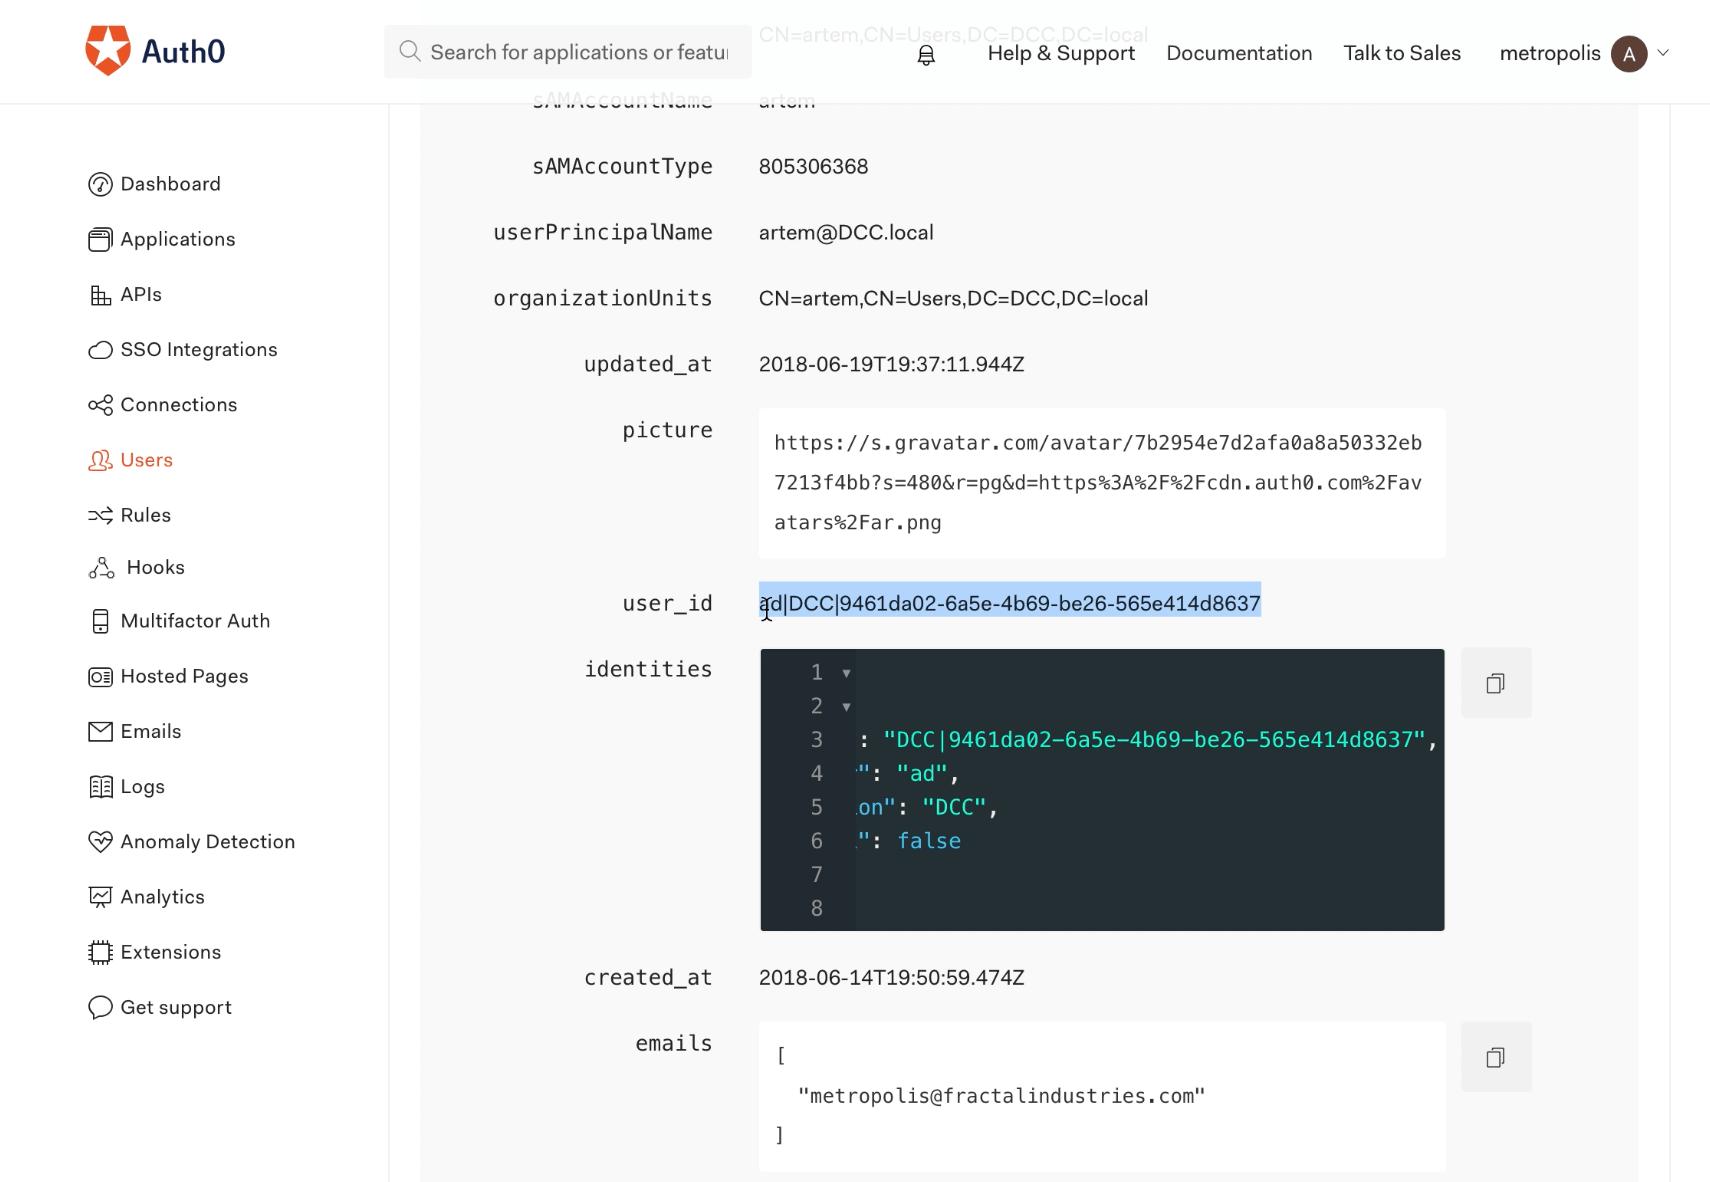 Auth0 user ID window